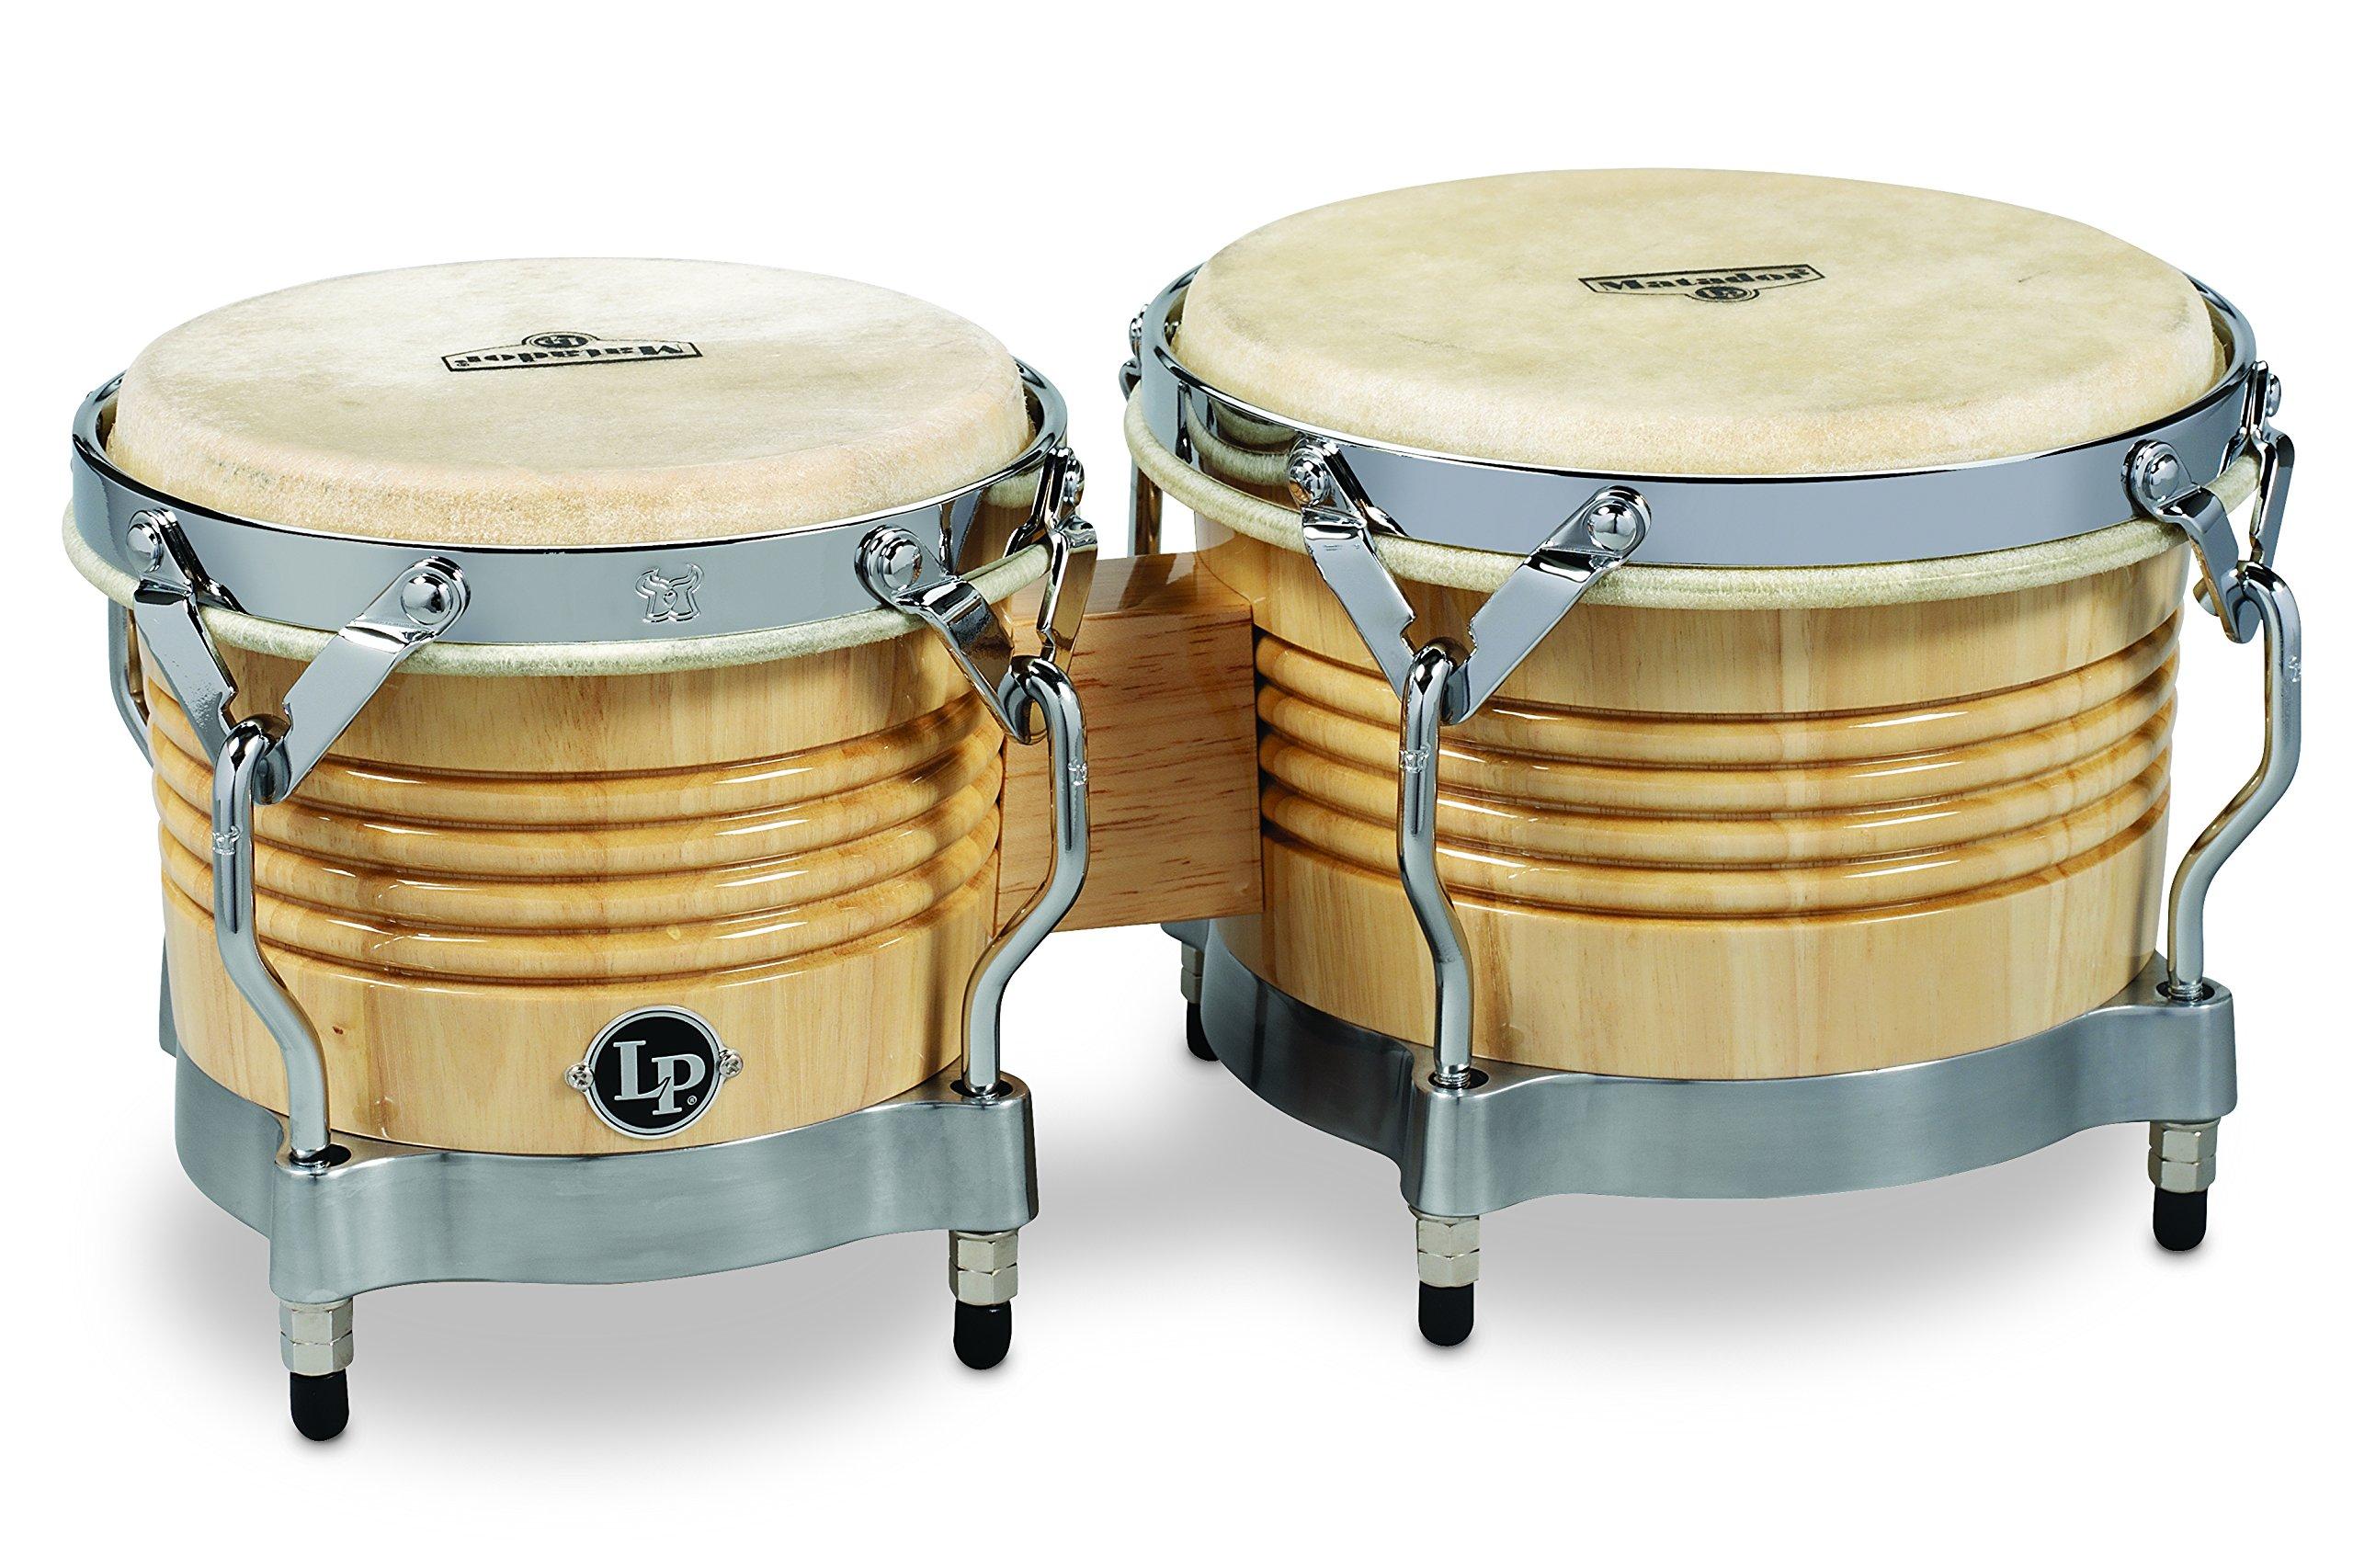 Latin Percussion M201-AWC LP Matador Wood Bongos - Natural/Chrome by Latin Percussion